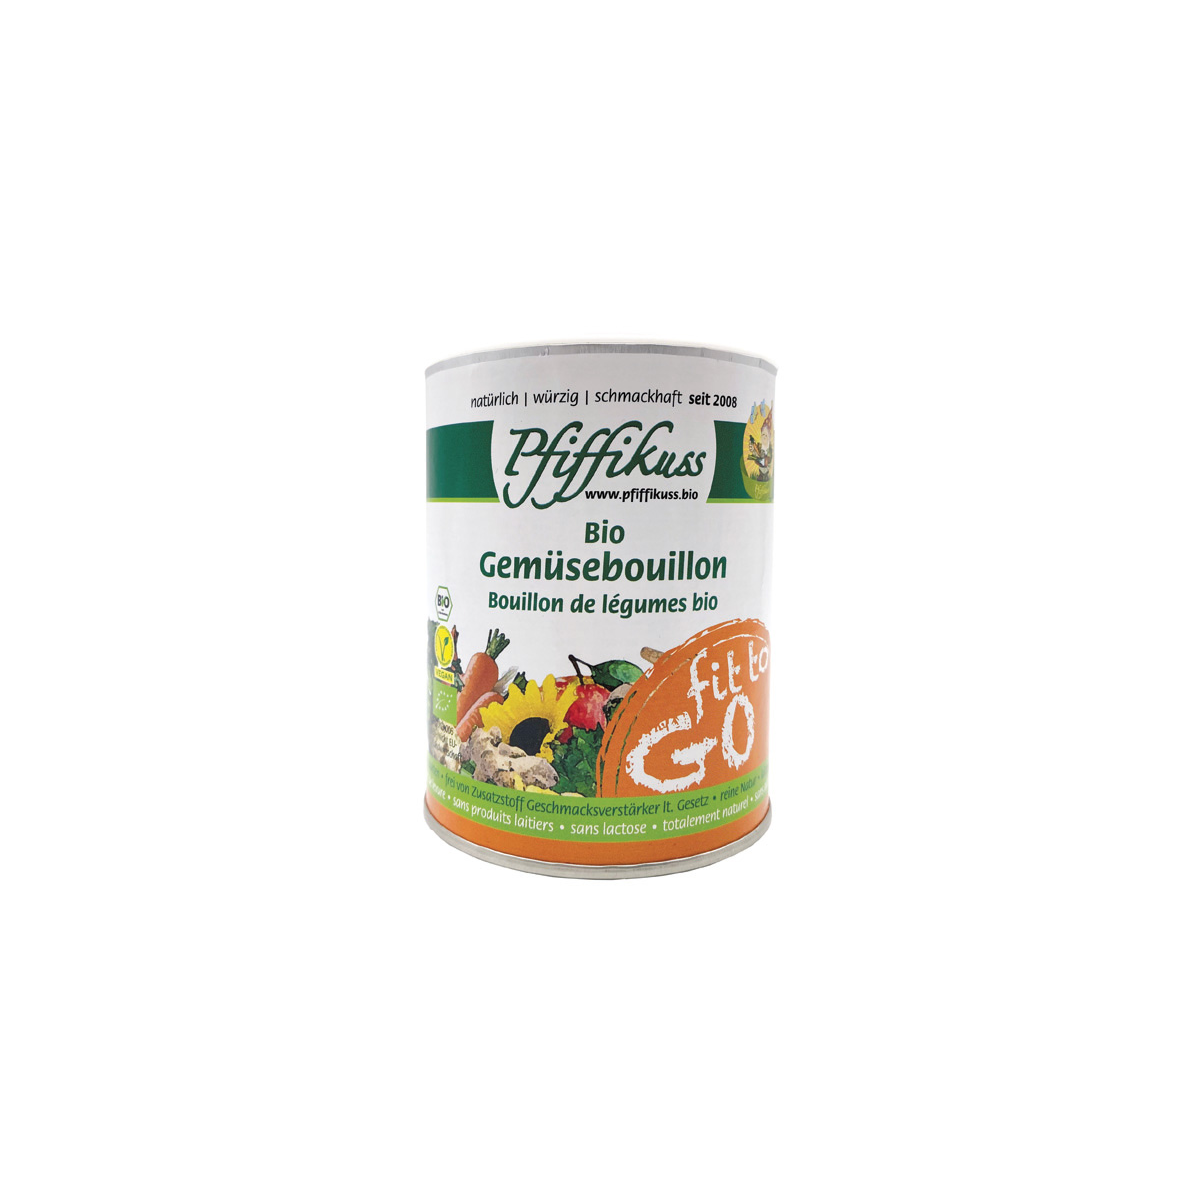 Gemüsebouillon Fit to go Pfiffikuss 125g